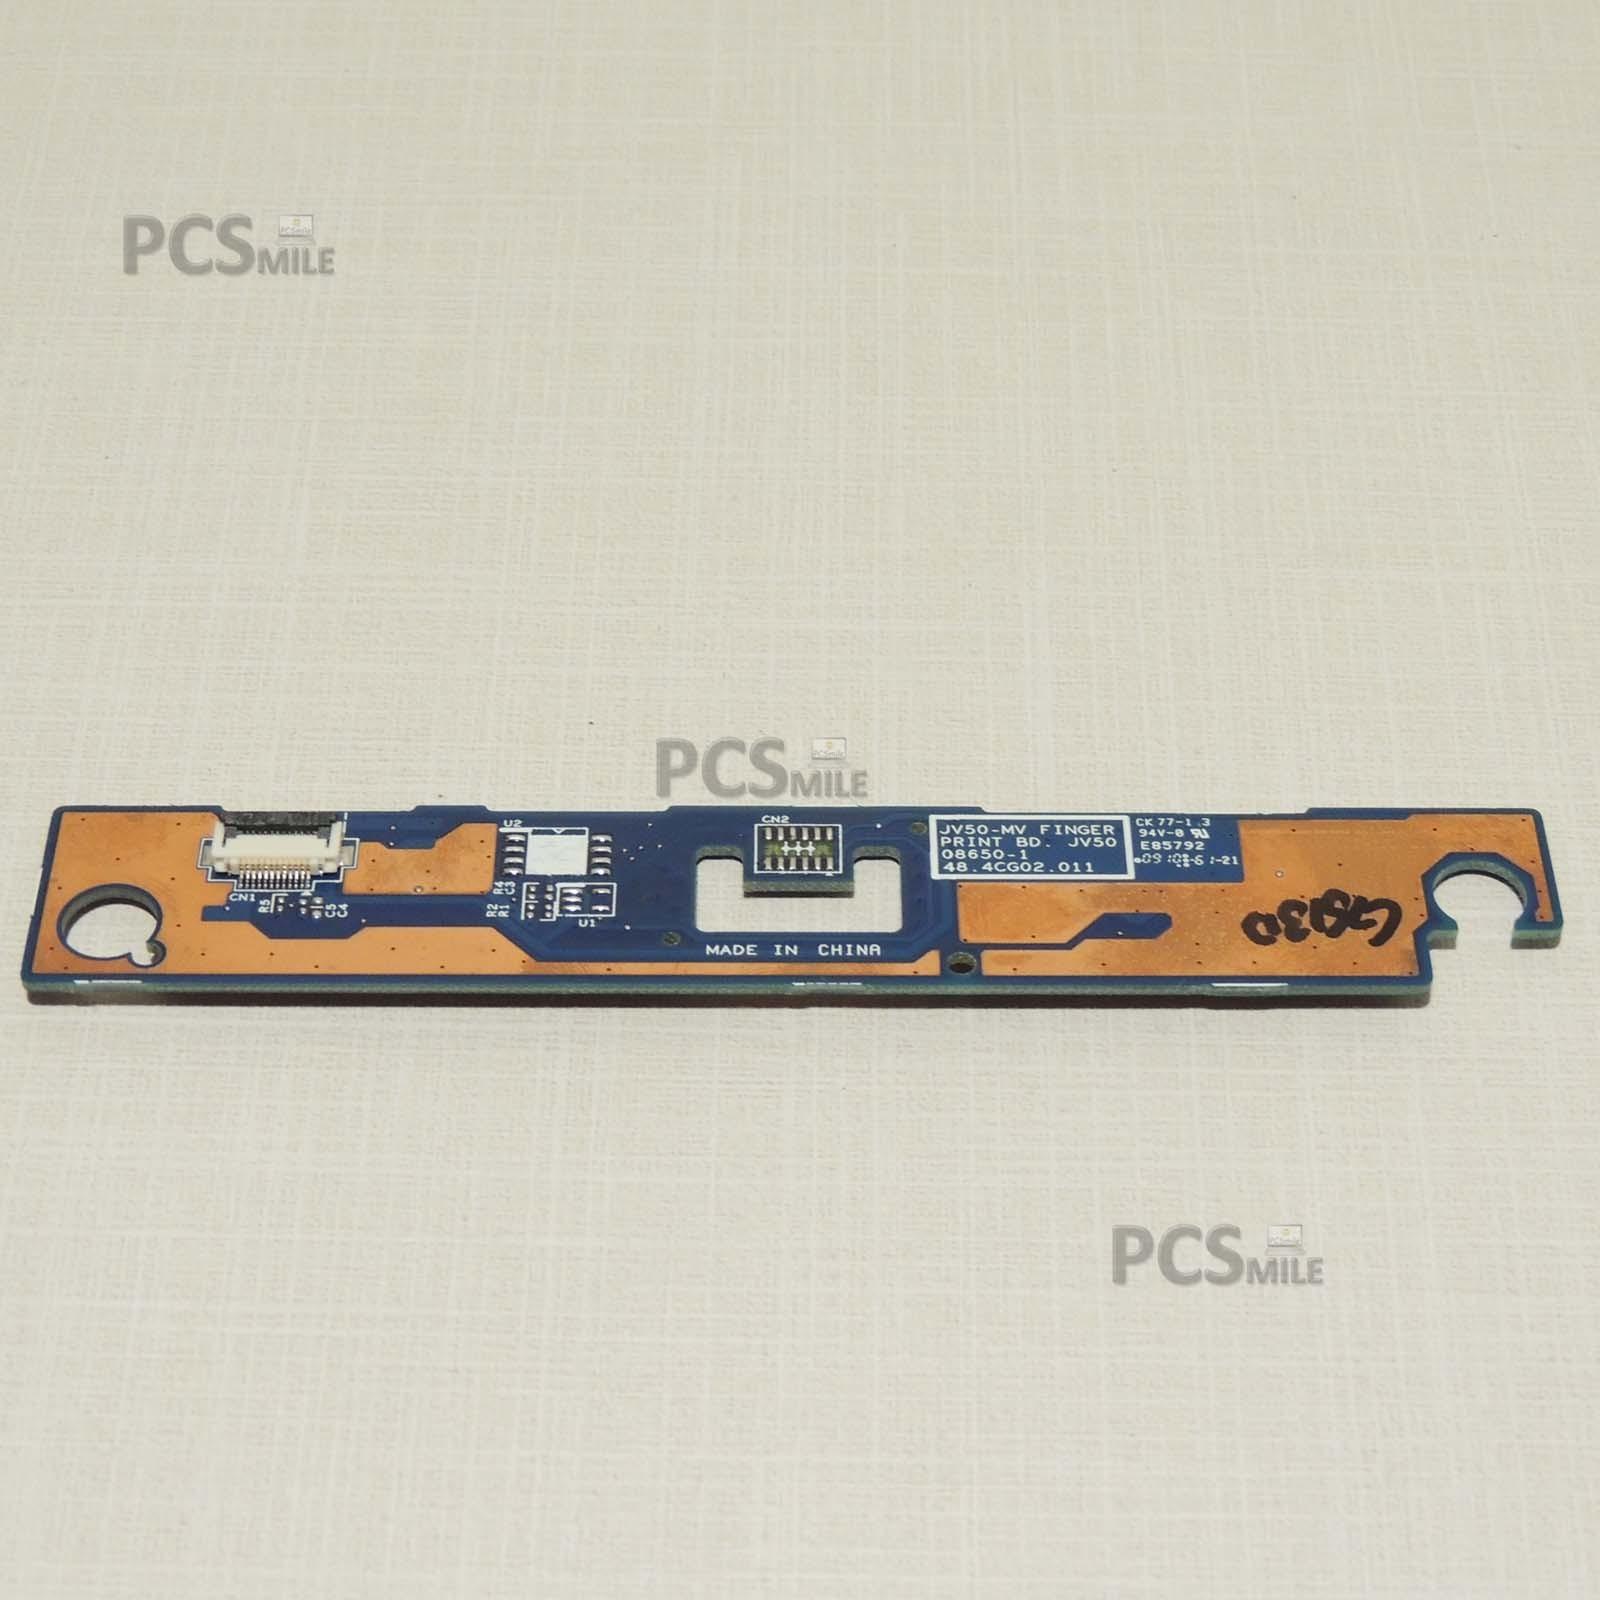 Tasti mouse button Acer Aspire 5536/5236 MS2265 48.4CG02.011